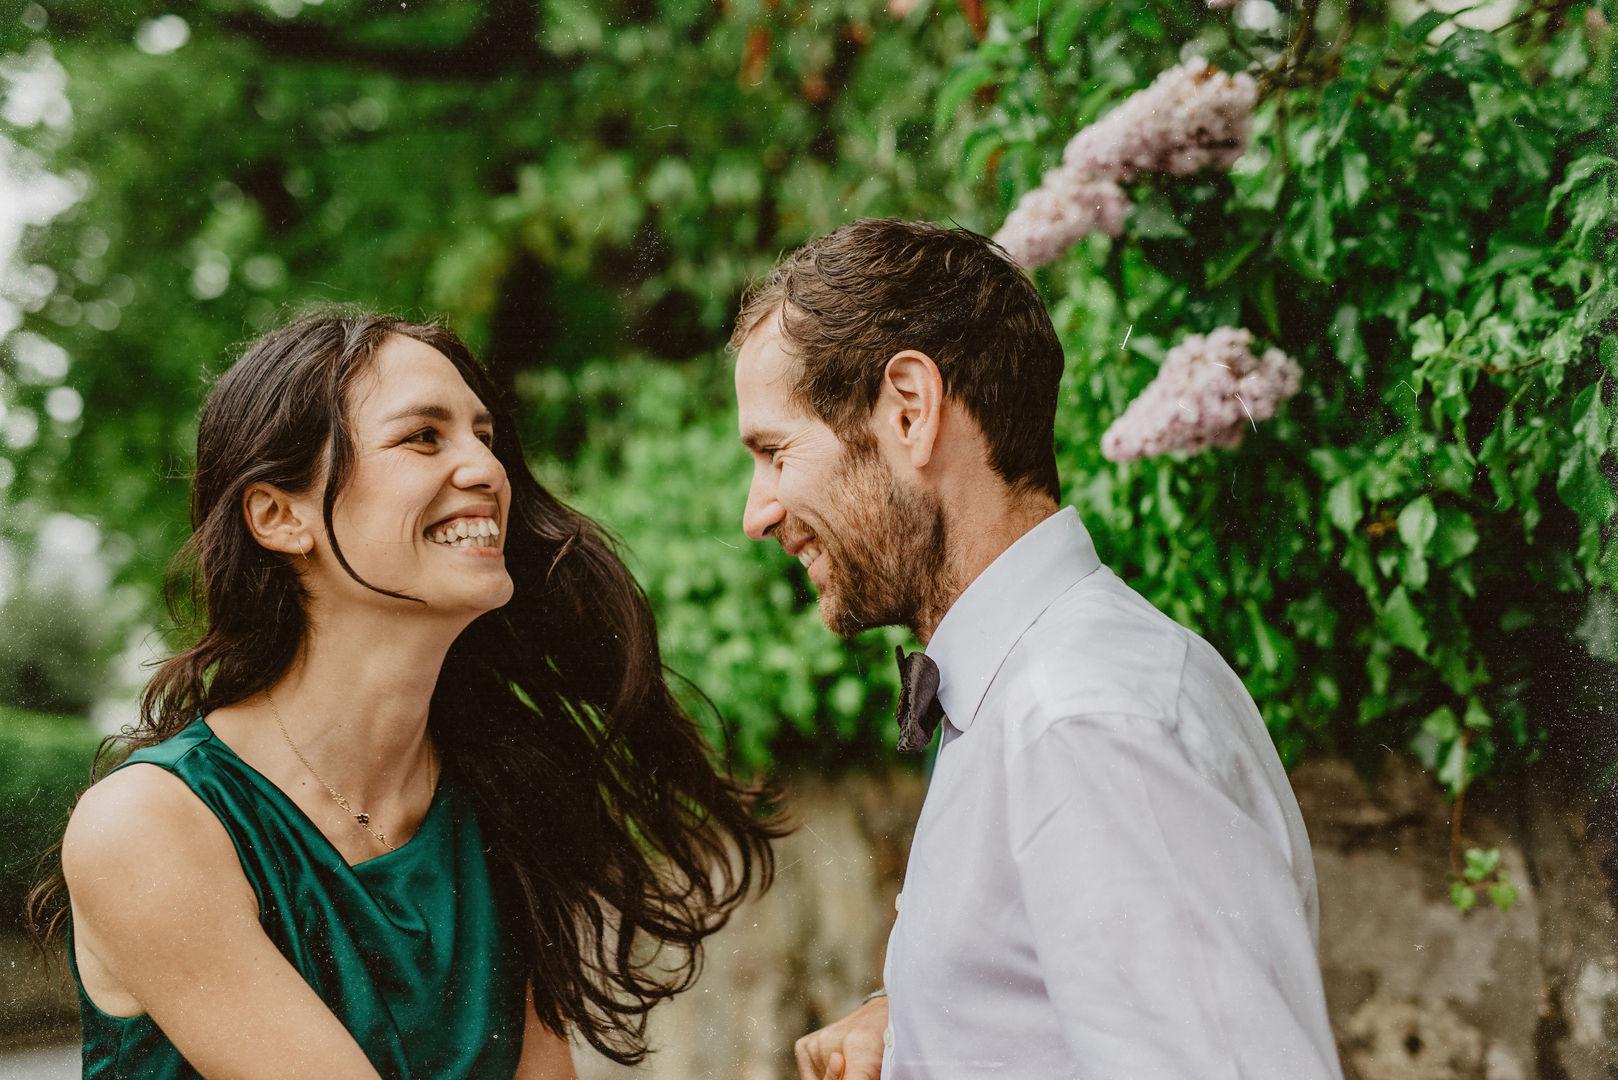 Romantic couple photo-shoot in Edinburgh, Scotland